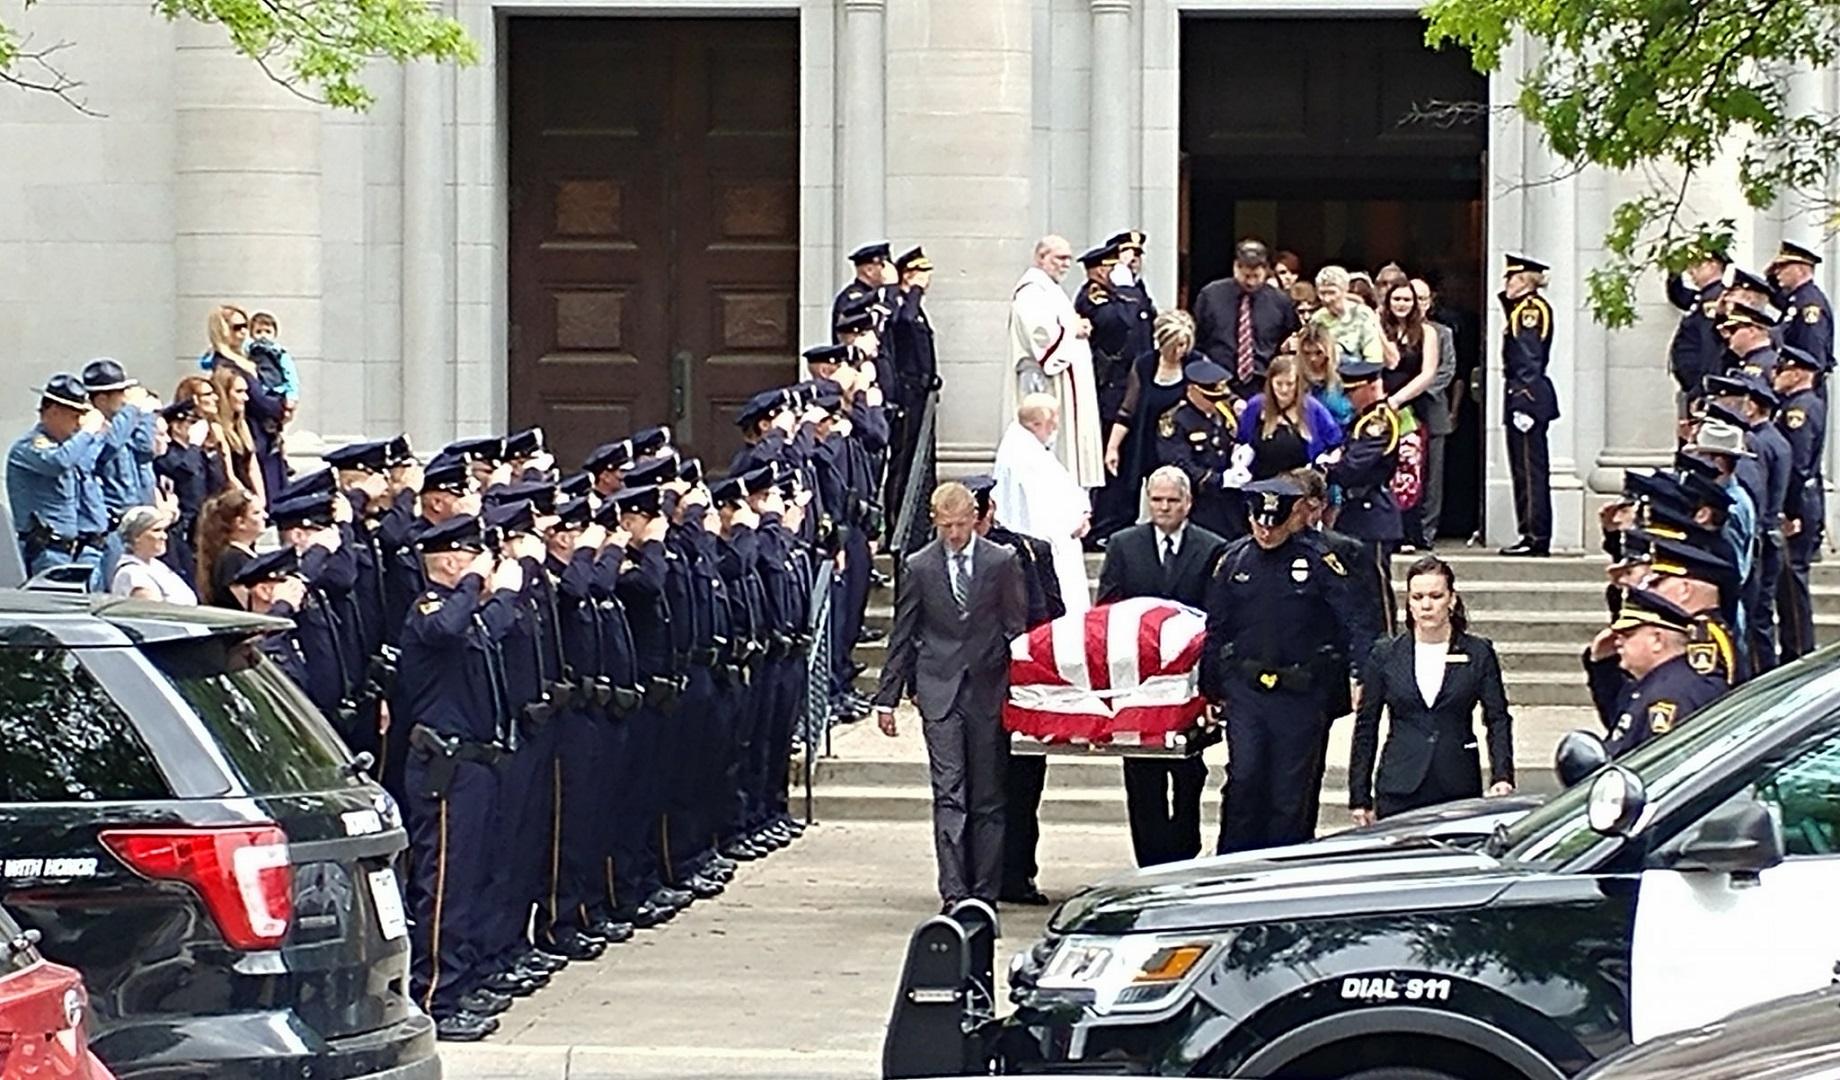 McCluskey Funeral